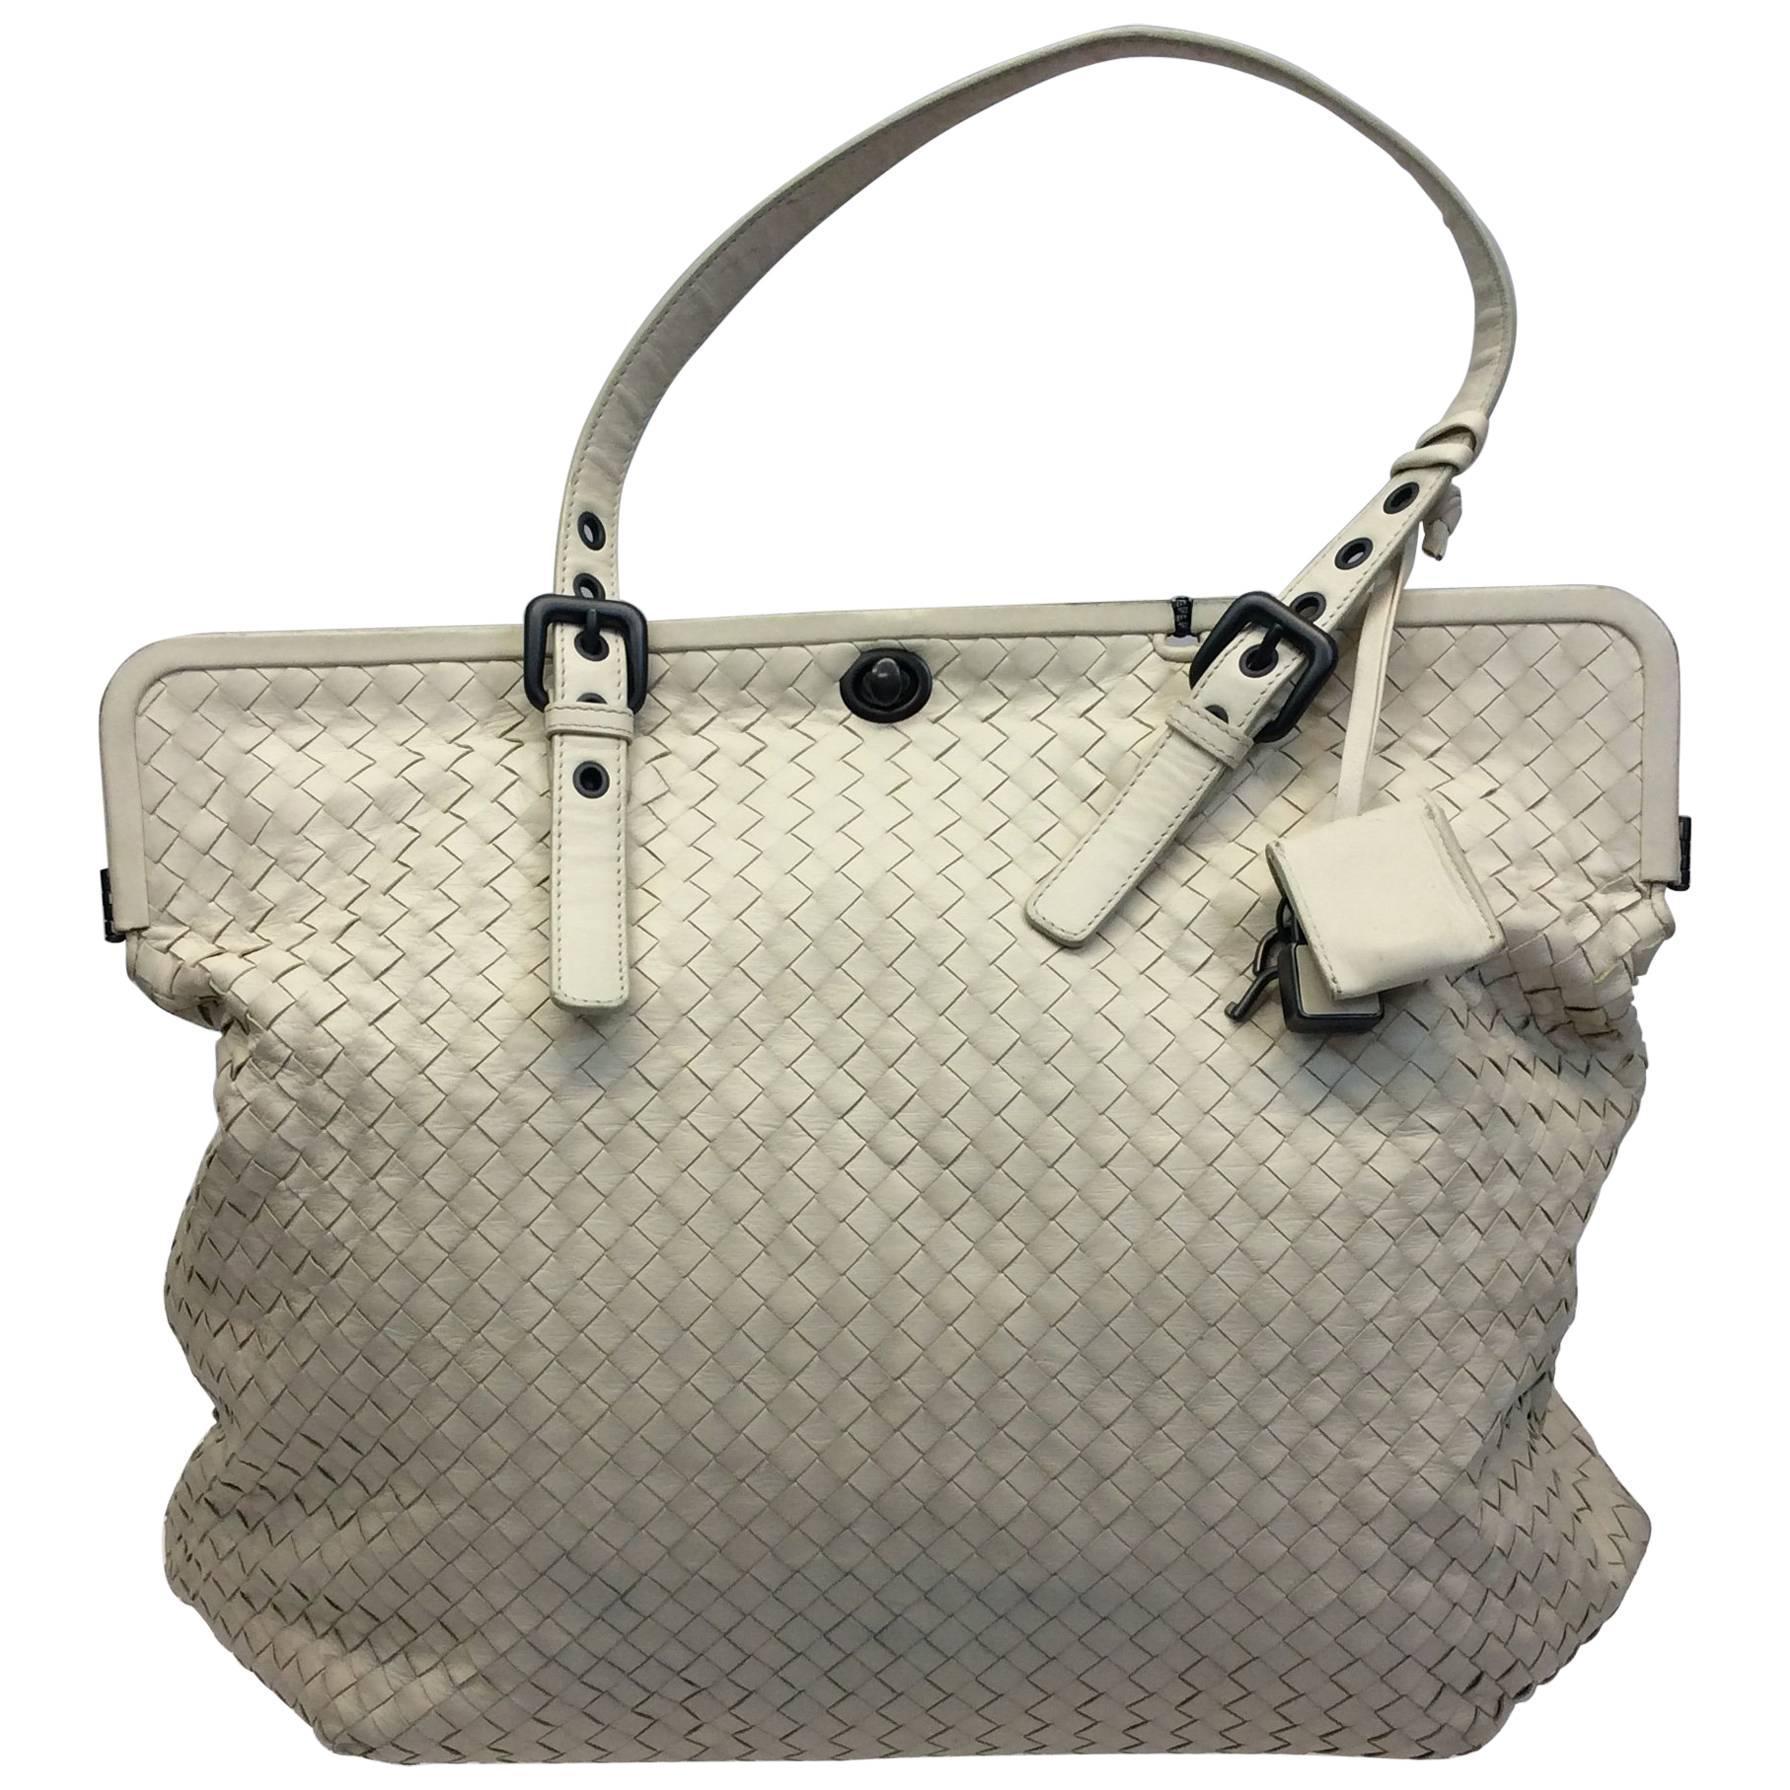 486d4a3381c6 Bottega Veneta White Woven Leather Shoulder Bag For Sale at 1stdibs